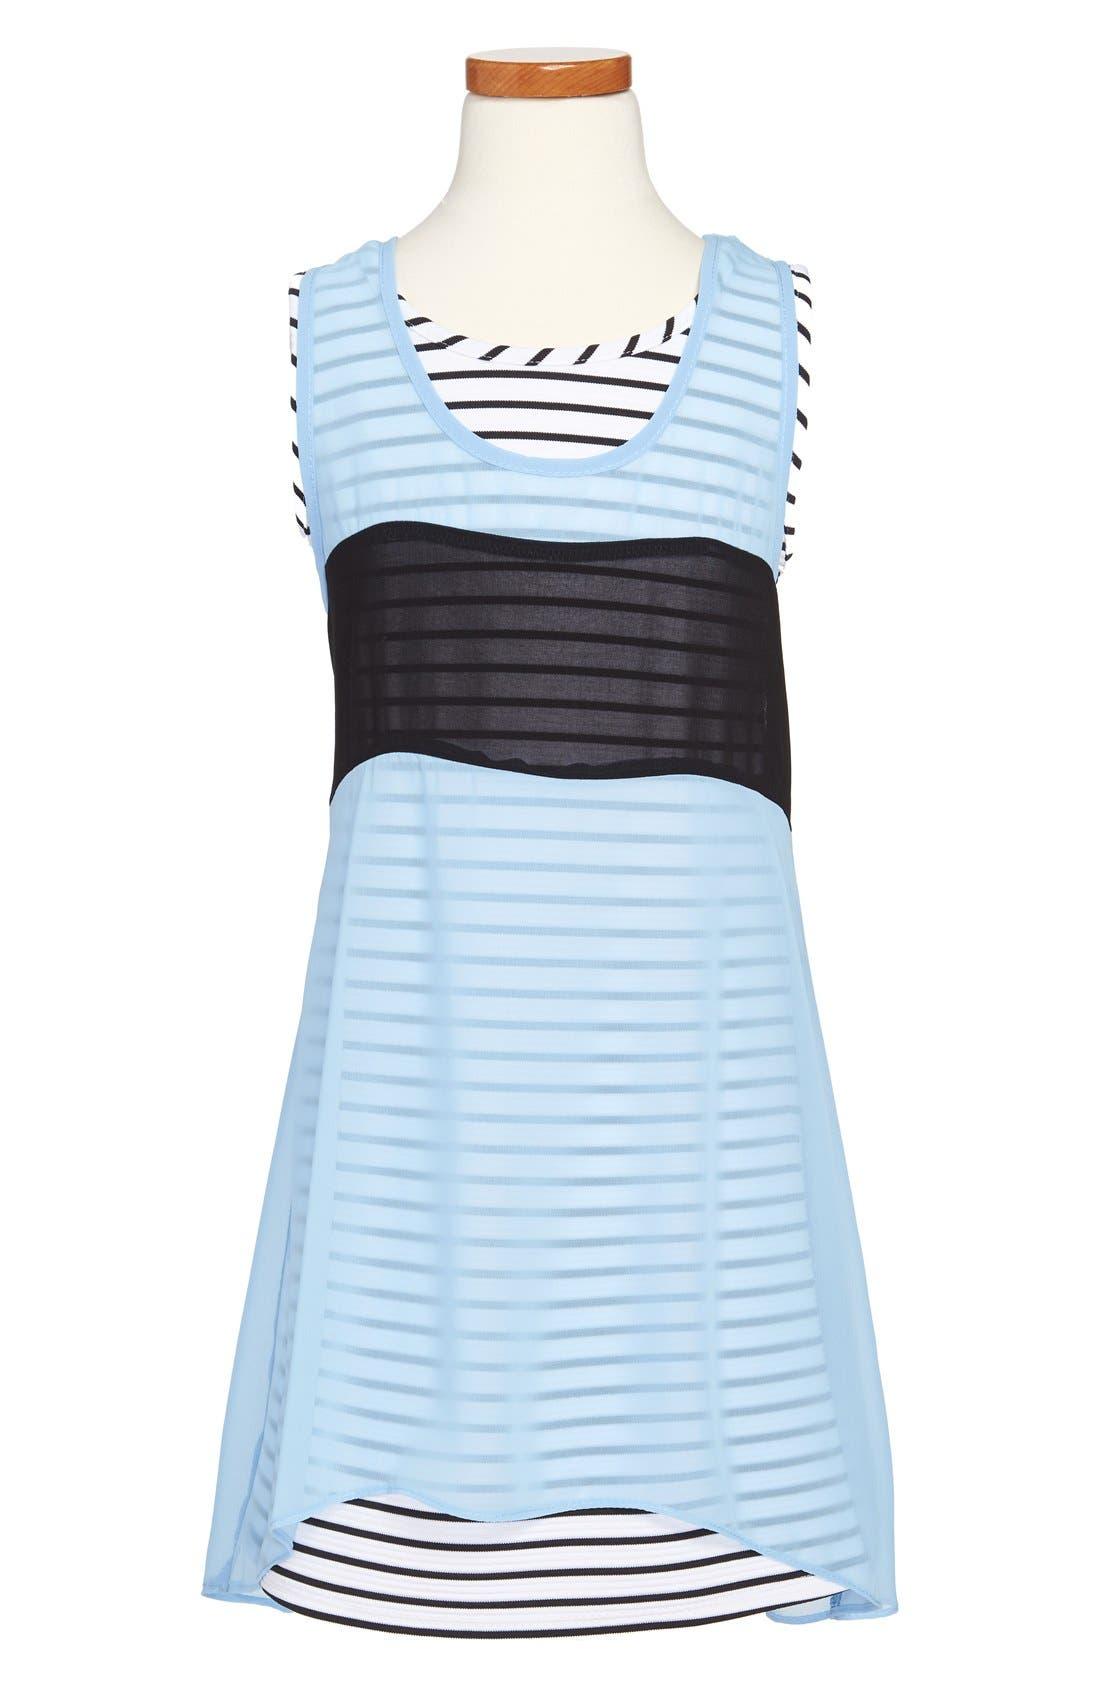 Main Image - Sally Miller 'OC' Dress (Big Girls)